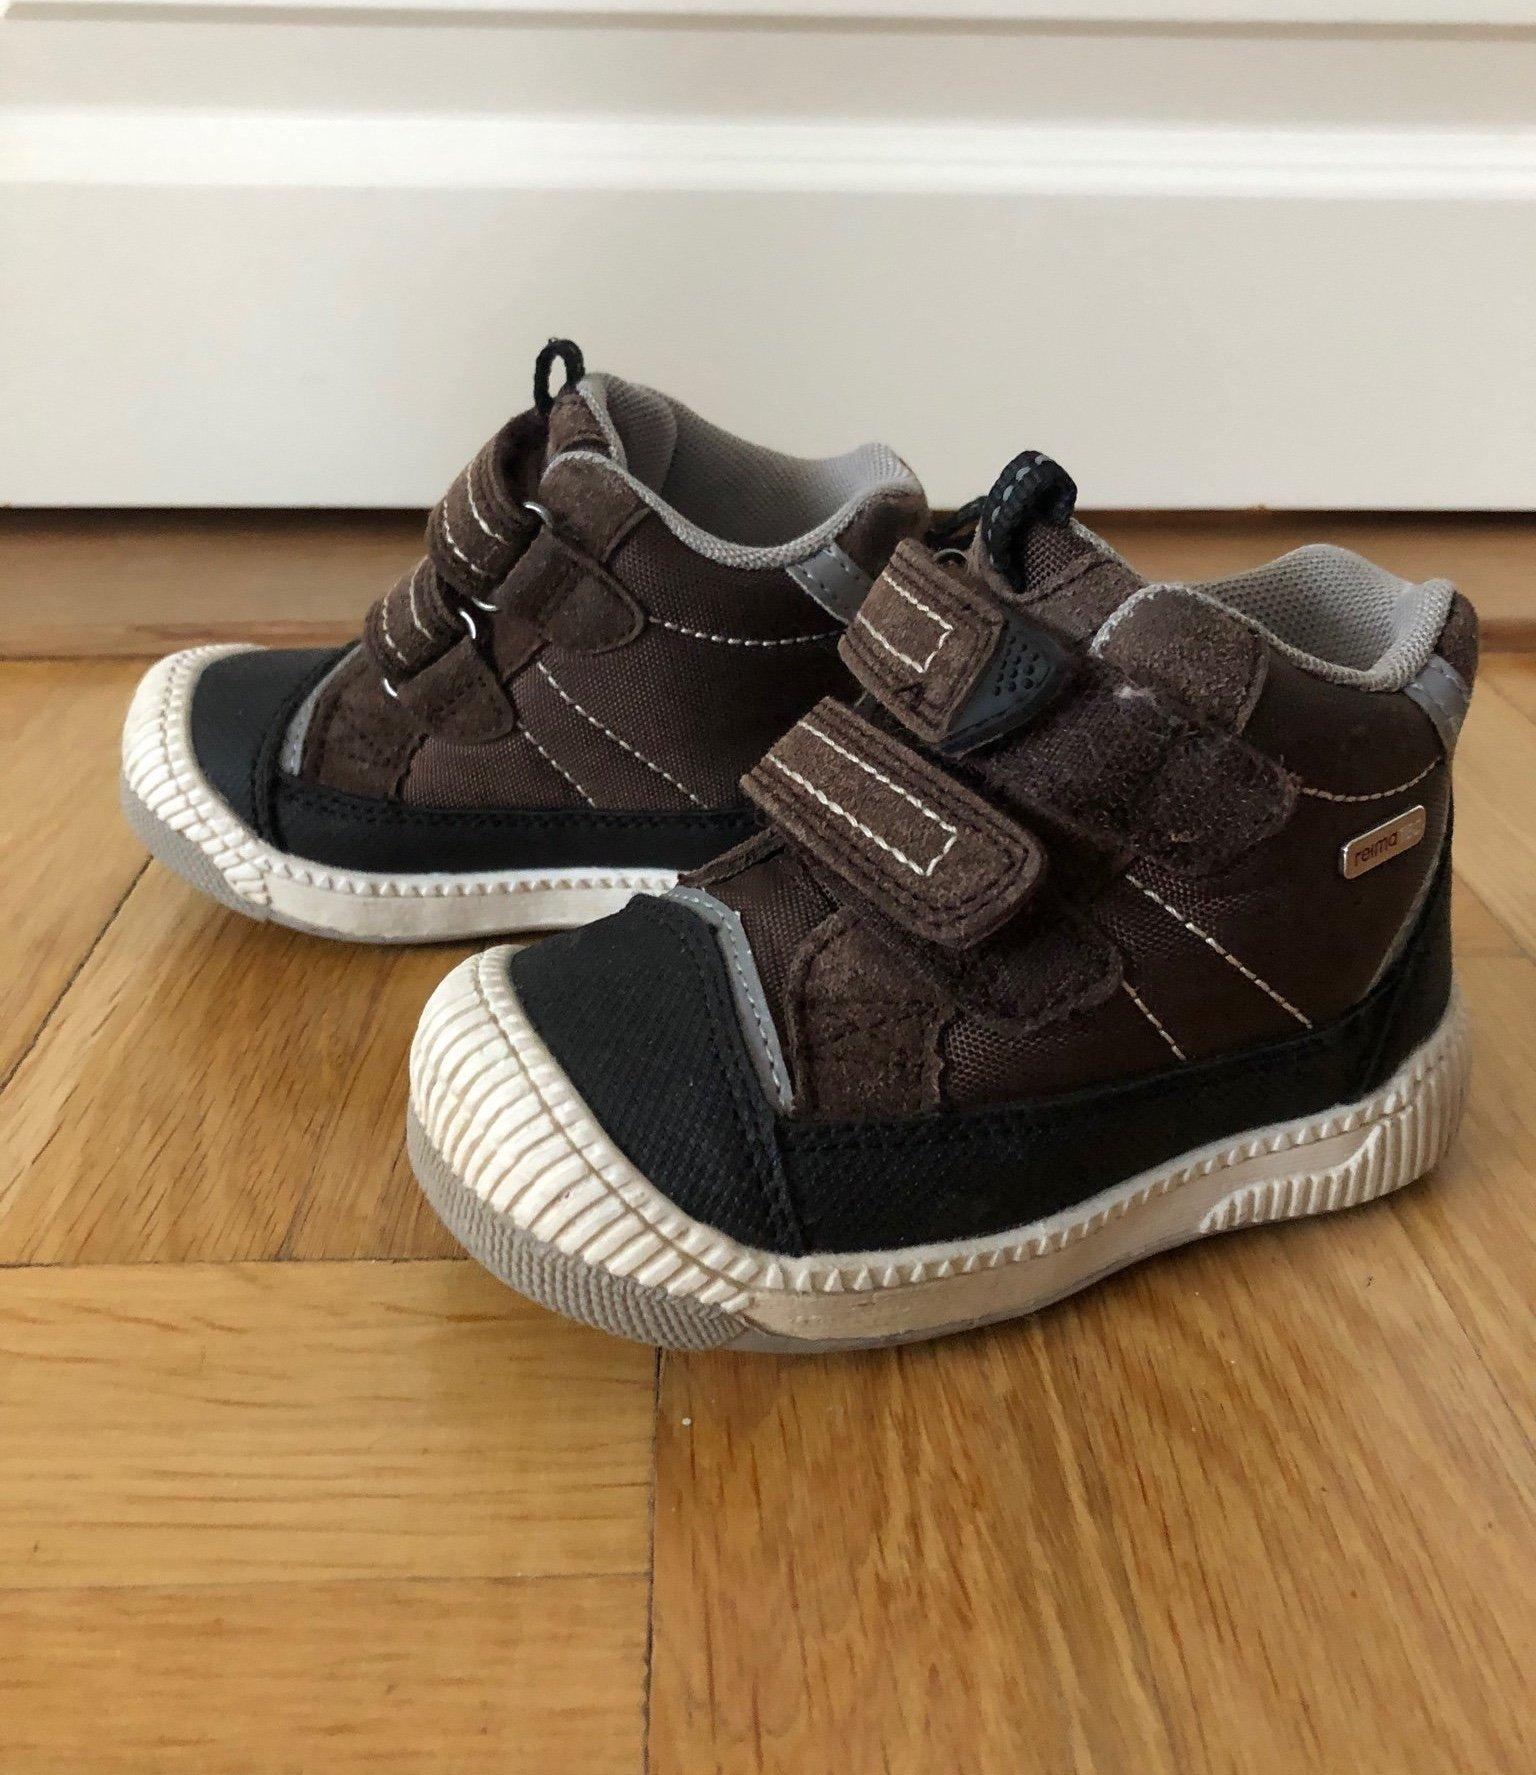 Reima Passo kängorsneakers halvhög modell, bruna, strl 22